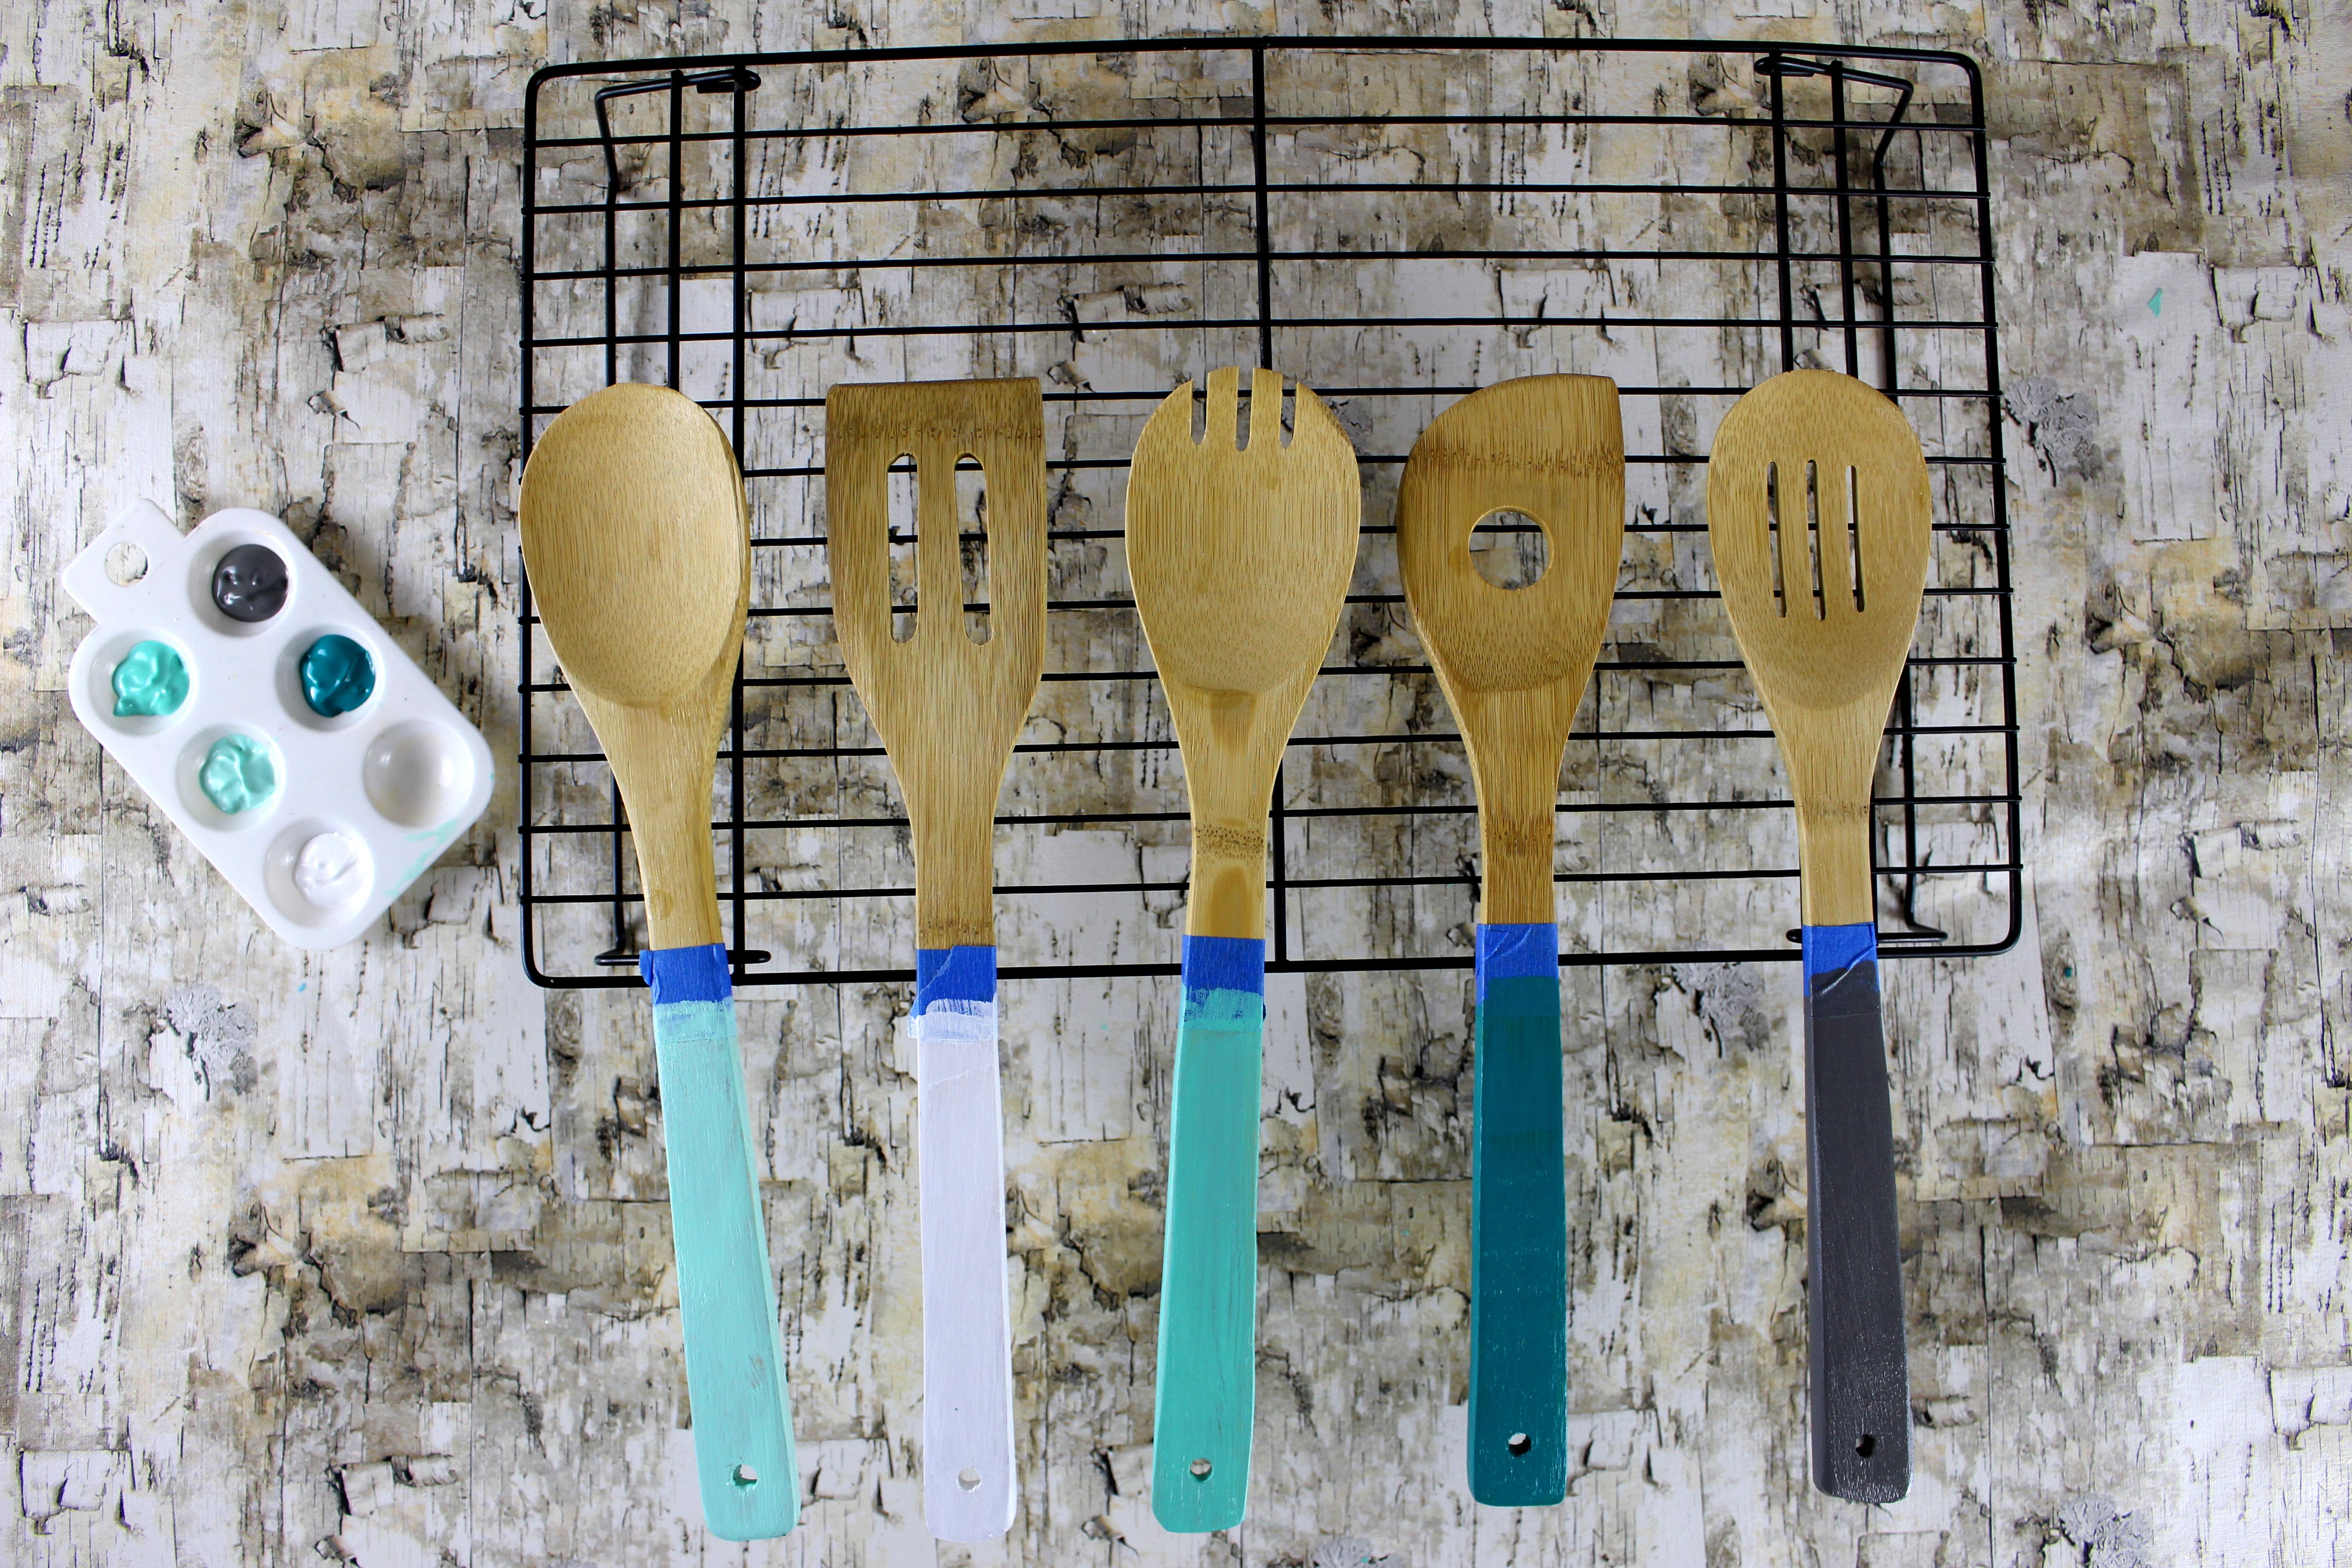 DIY Kitchen Utensils using Paint